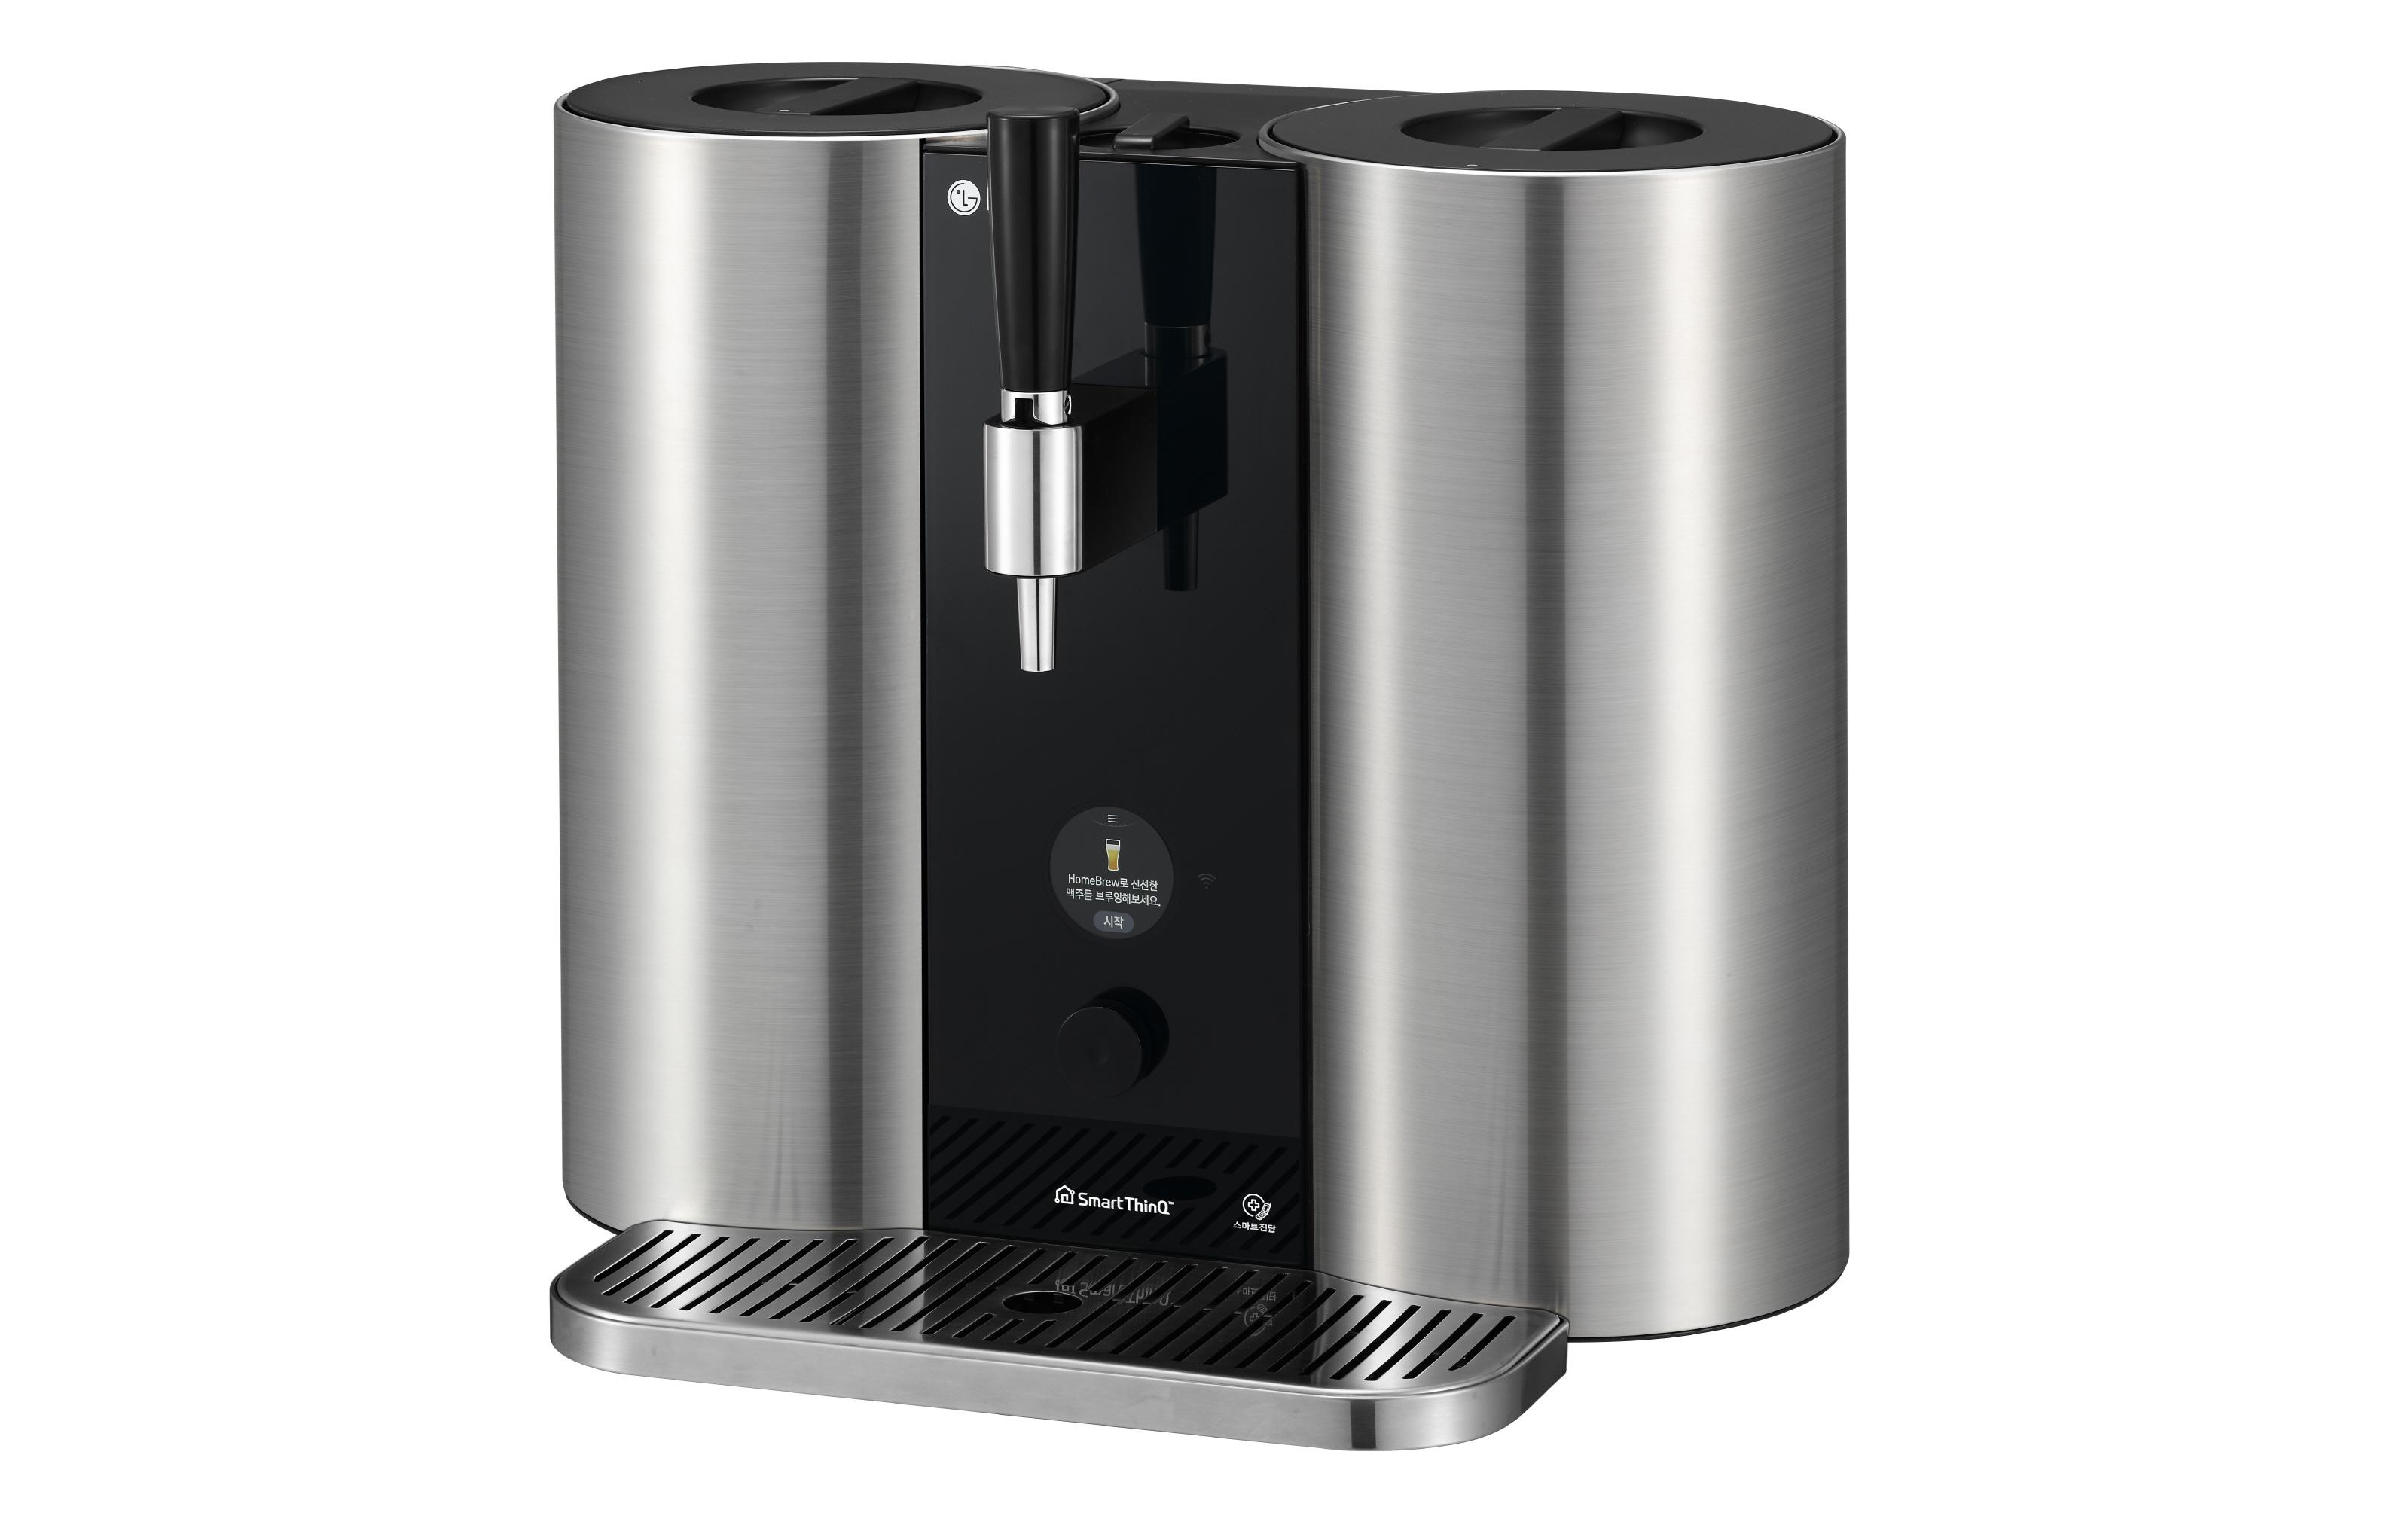 LG 홈브루(LG HomeBrew) 제품 사진. 이 제품은 복잡하고 어려운 맥주 제조 全 과정을 자동화해 누구나 손쉽게 나만의 수제맥주를 만들 수 있는 혁신적인 캡슐맥주제조기다. 97년 전통의 세계적 몰트제조사 영국 문톤스(Muntons)와 캡슐을 공동 개발했다. 대표적인 영국식 에일 맥주인 페일 에일(Pale Ale), 인도식 페일에일(India Pale Ale), 흑맥주(Stout), 밀맥주(Wheat), 친숙한 라거 맥주인 필스너(Pilsner) 등 인기 맥주 5종을 취향에 따라 직접 제조할 수 있다.